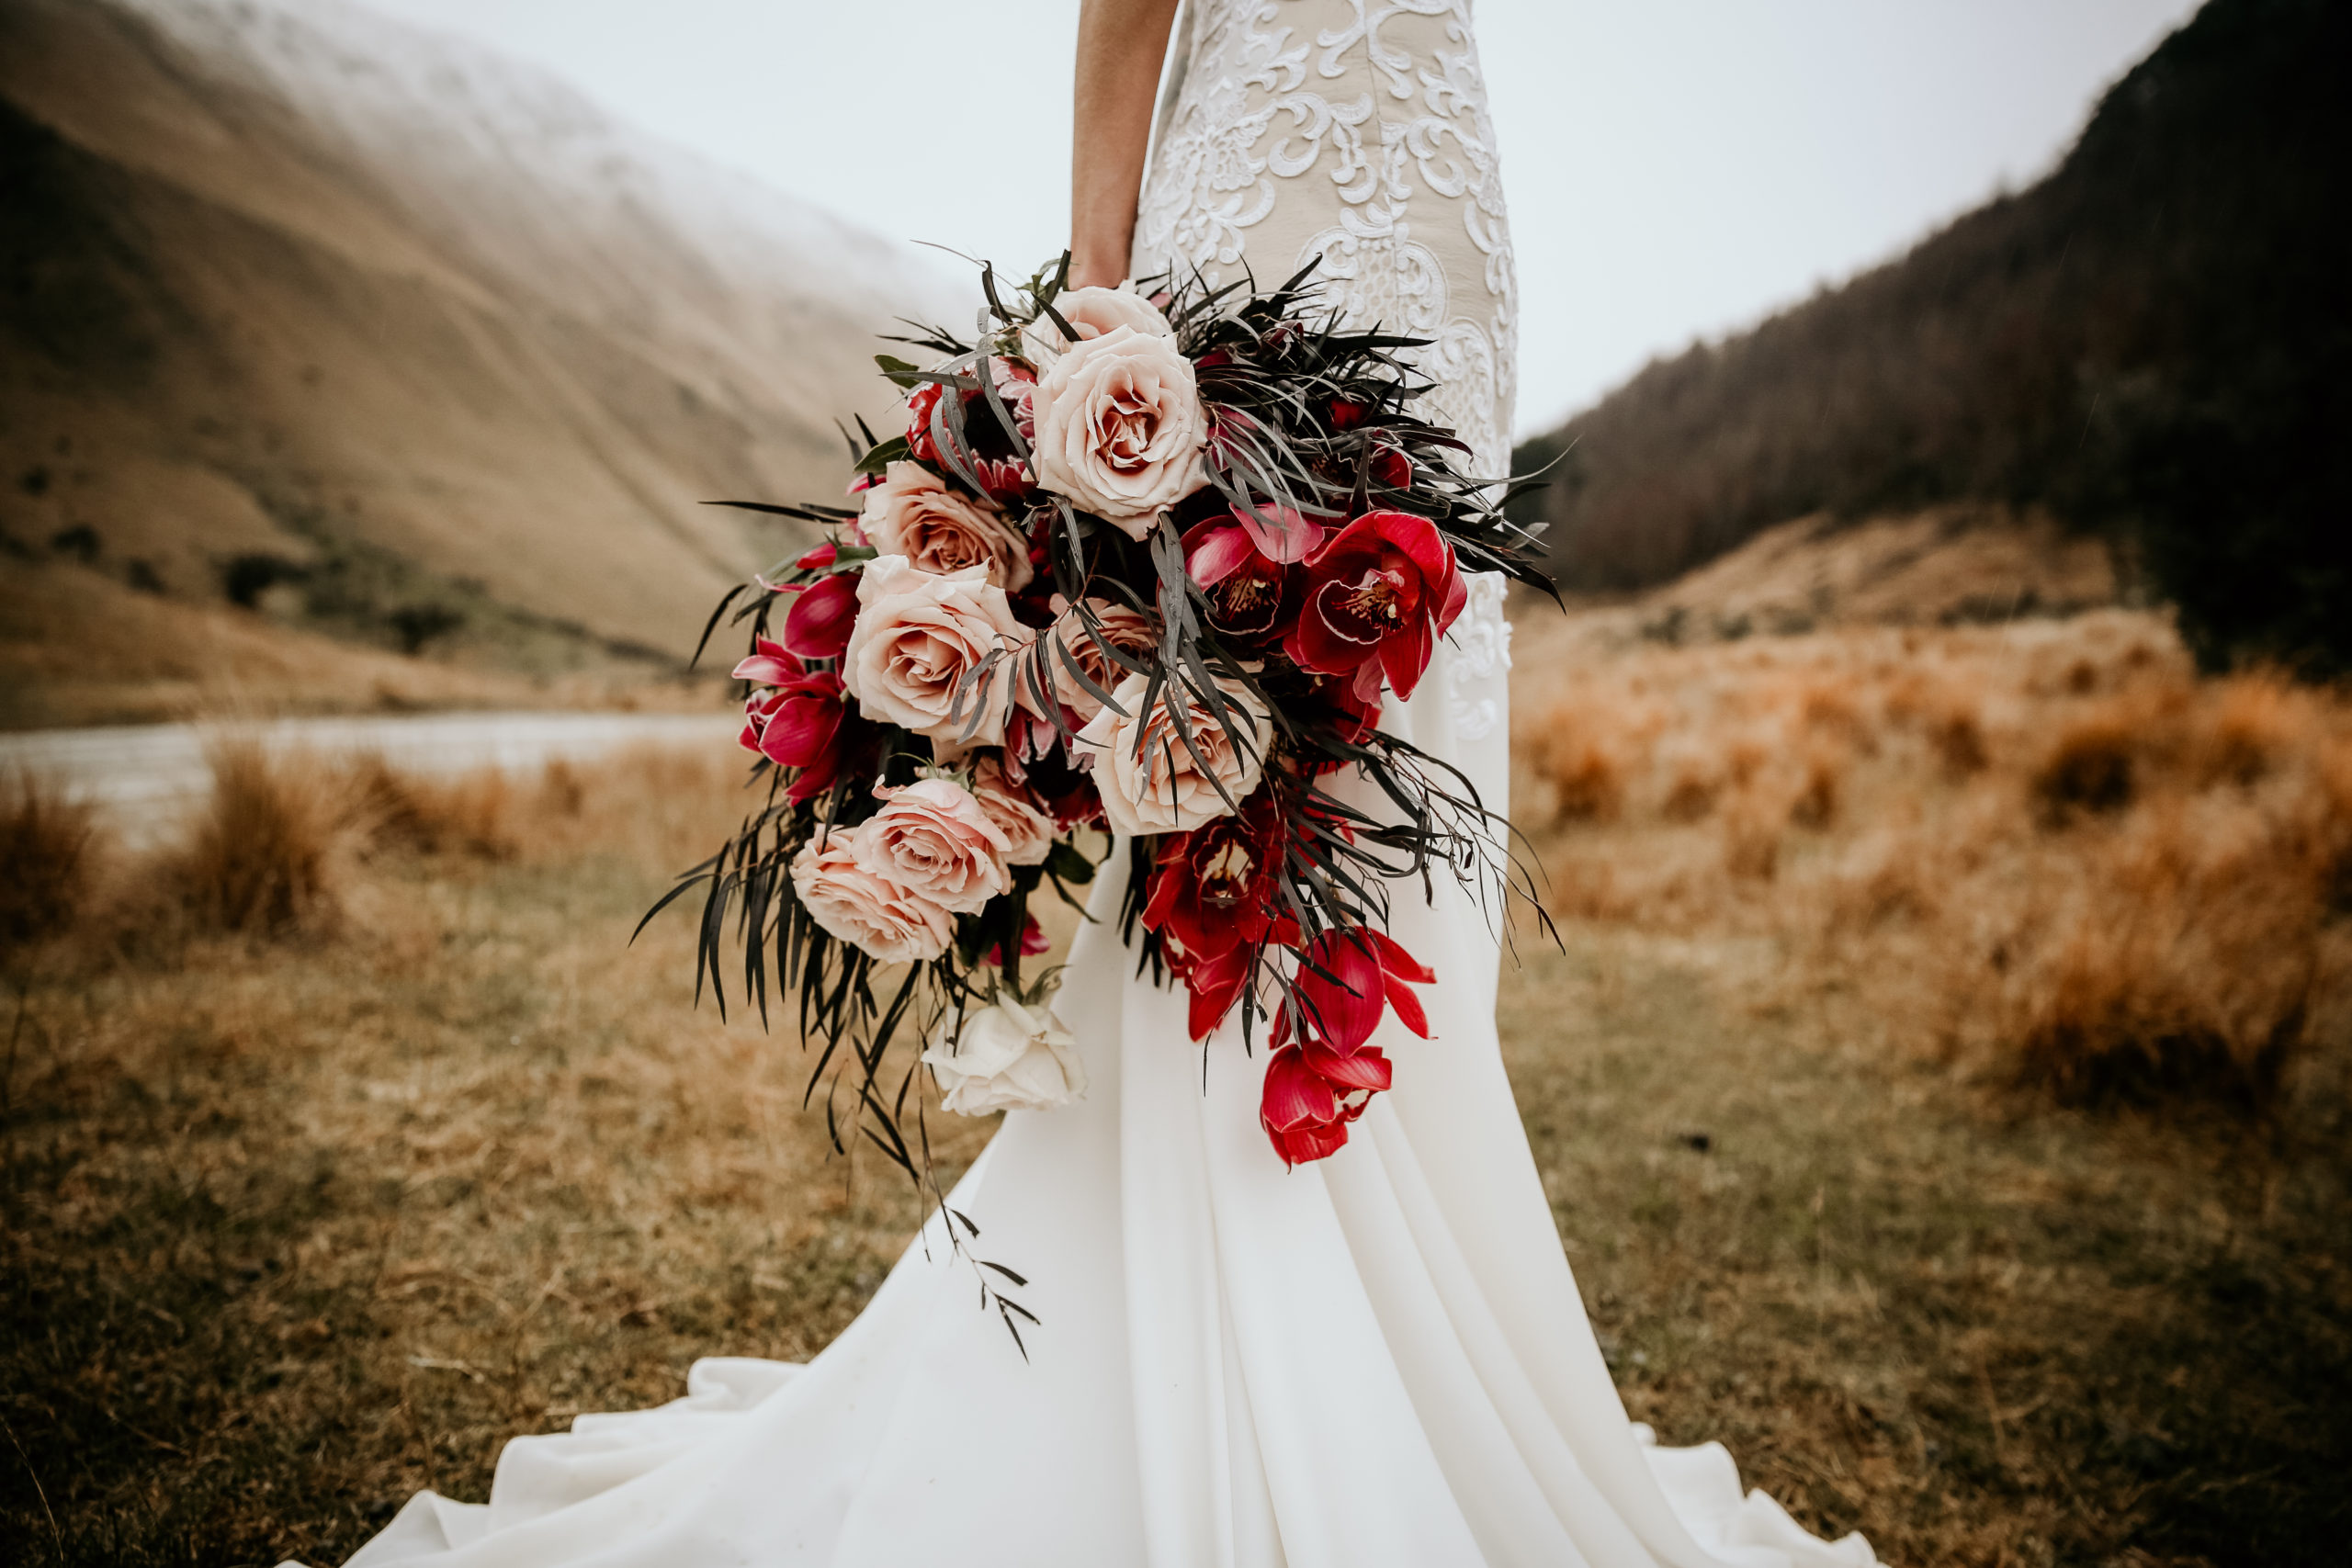 Bridal bouquet blush burgundy - Bespoke Weddings and Events